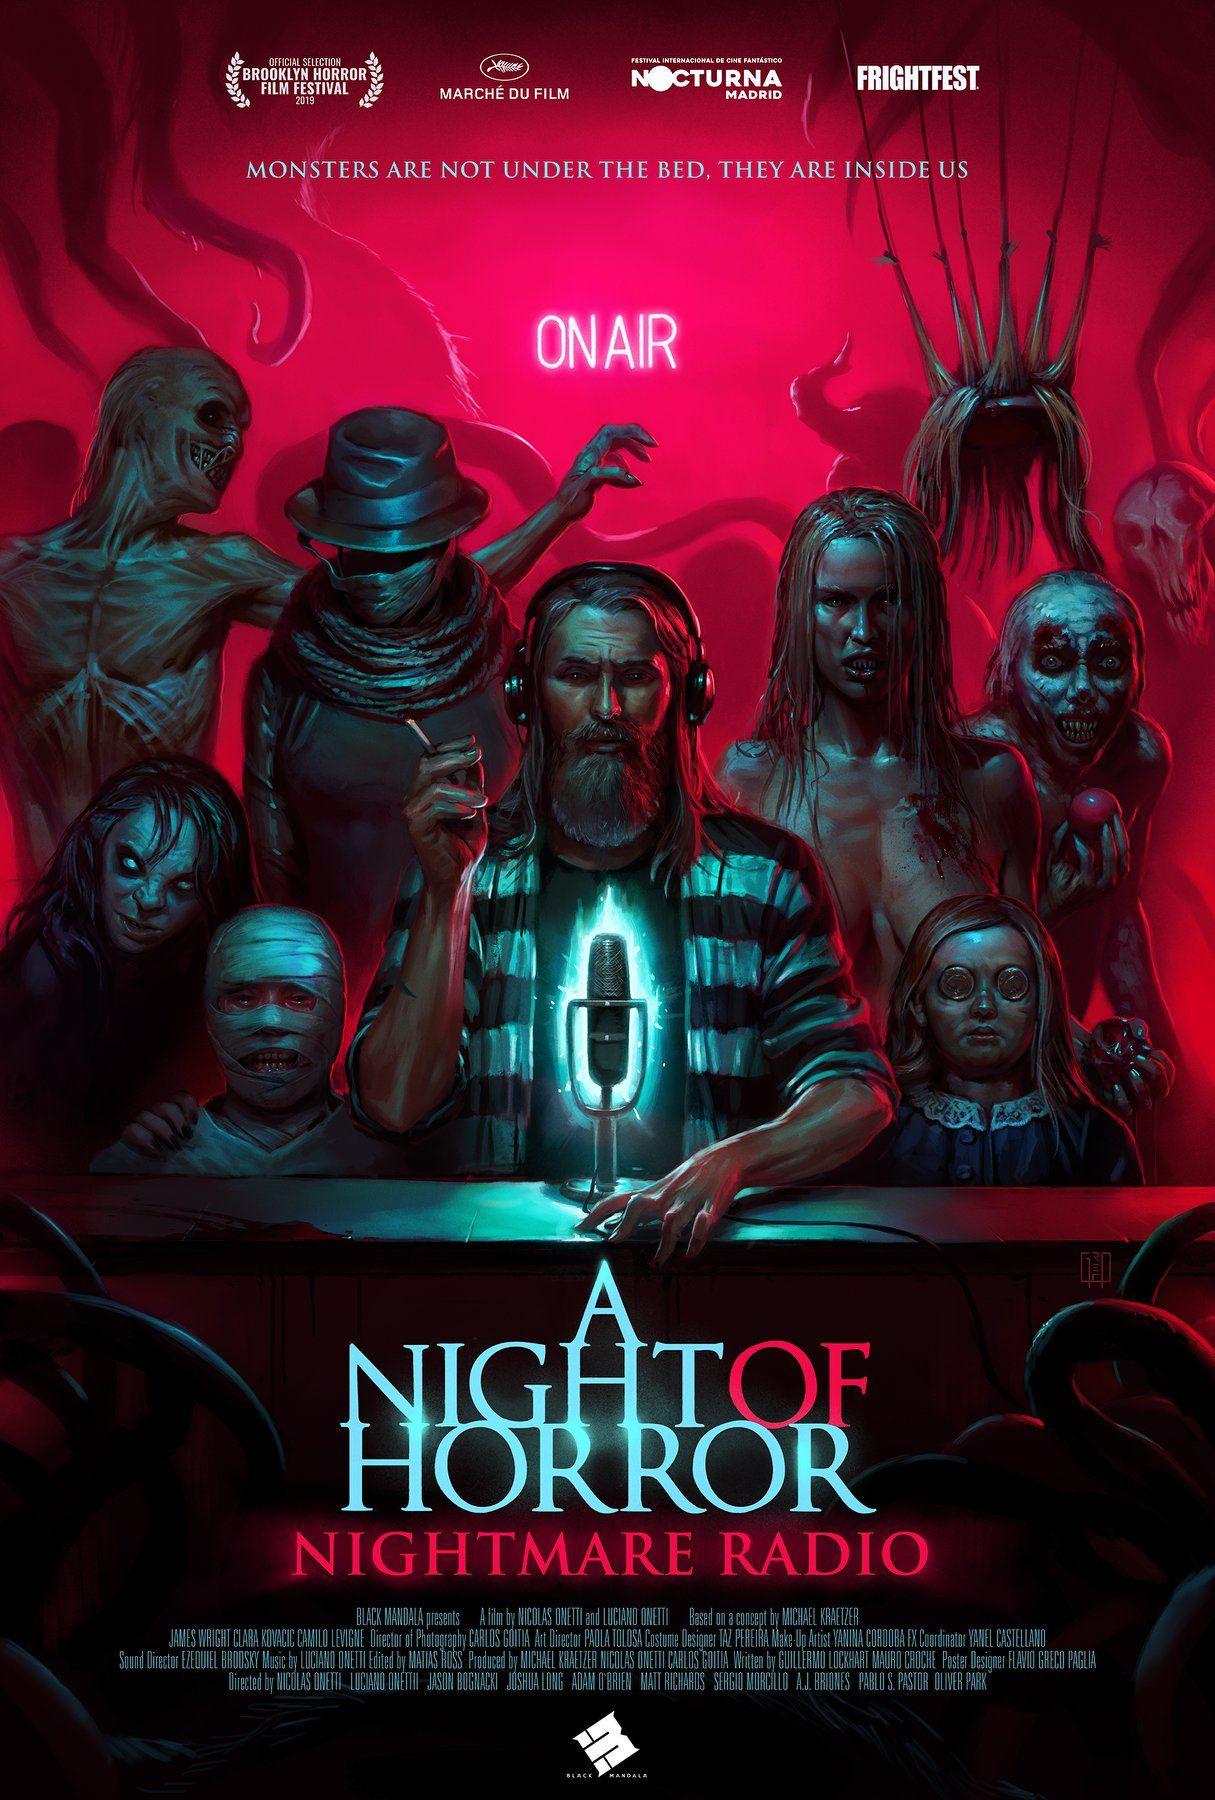 ElOscuroRinconDelTerror HorrorMovies A night of horror